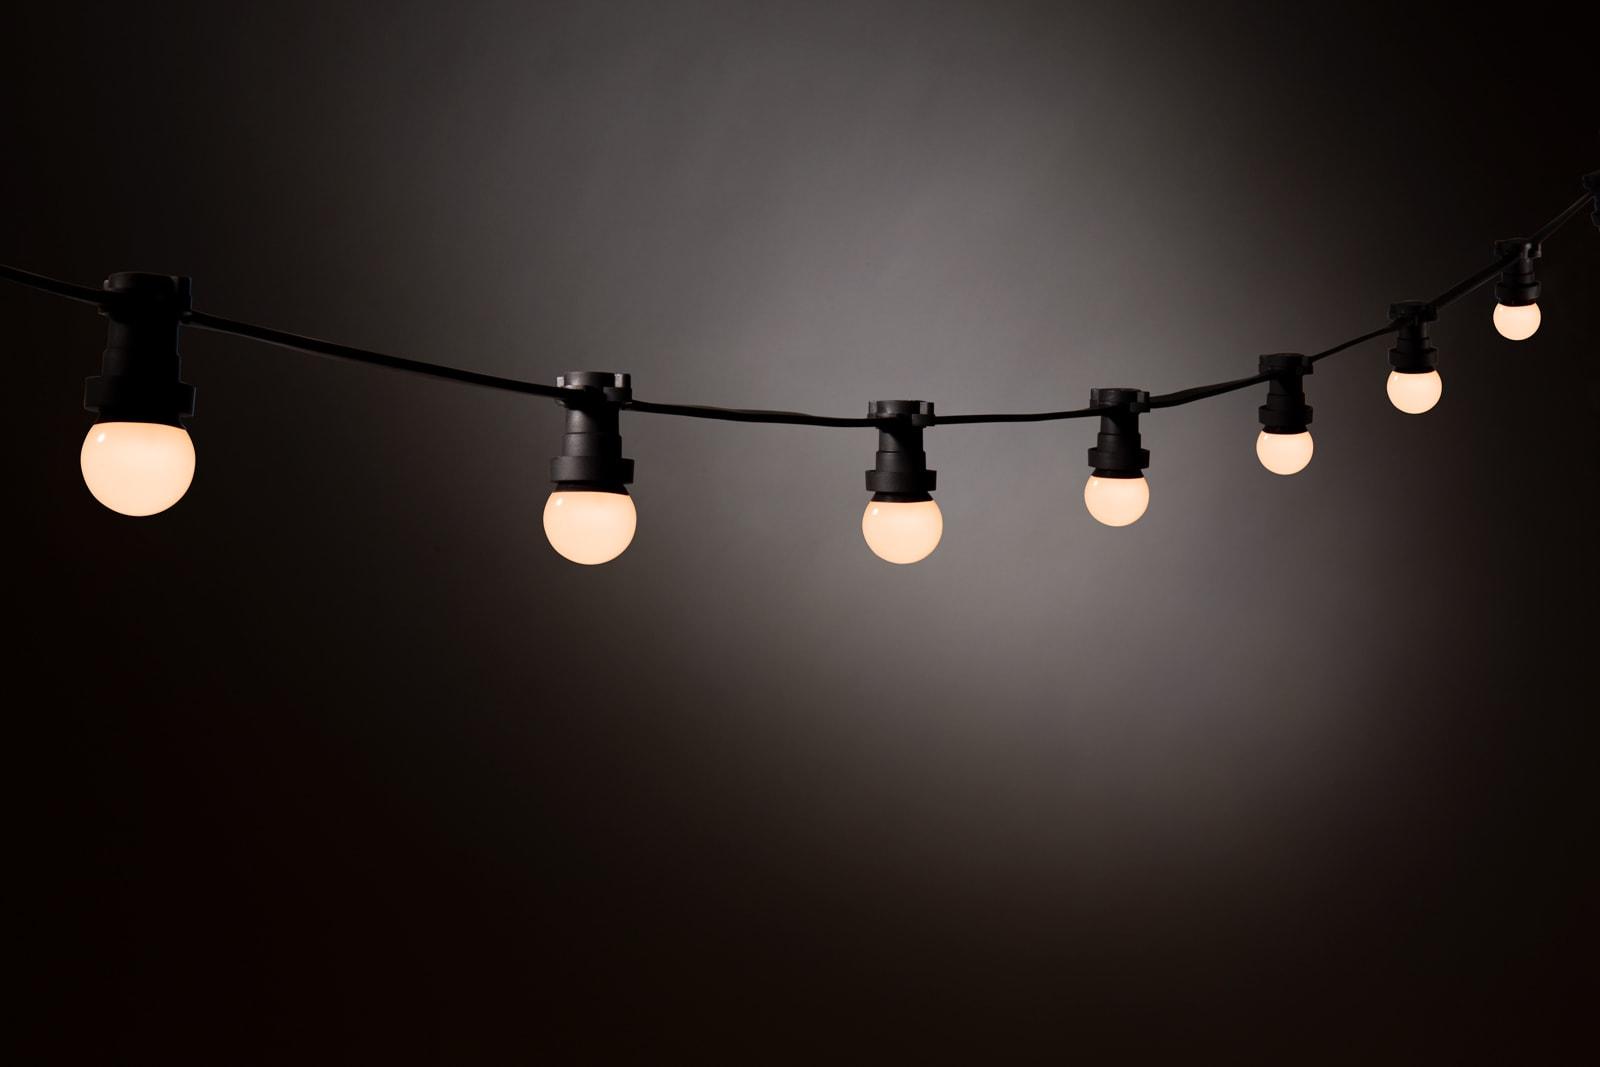 Prikkabel Led Lampen : Prikkabel led lamp u warm wit u melkwitte bol kerstverlichting